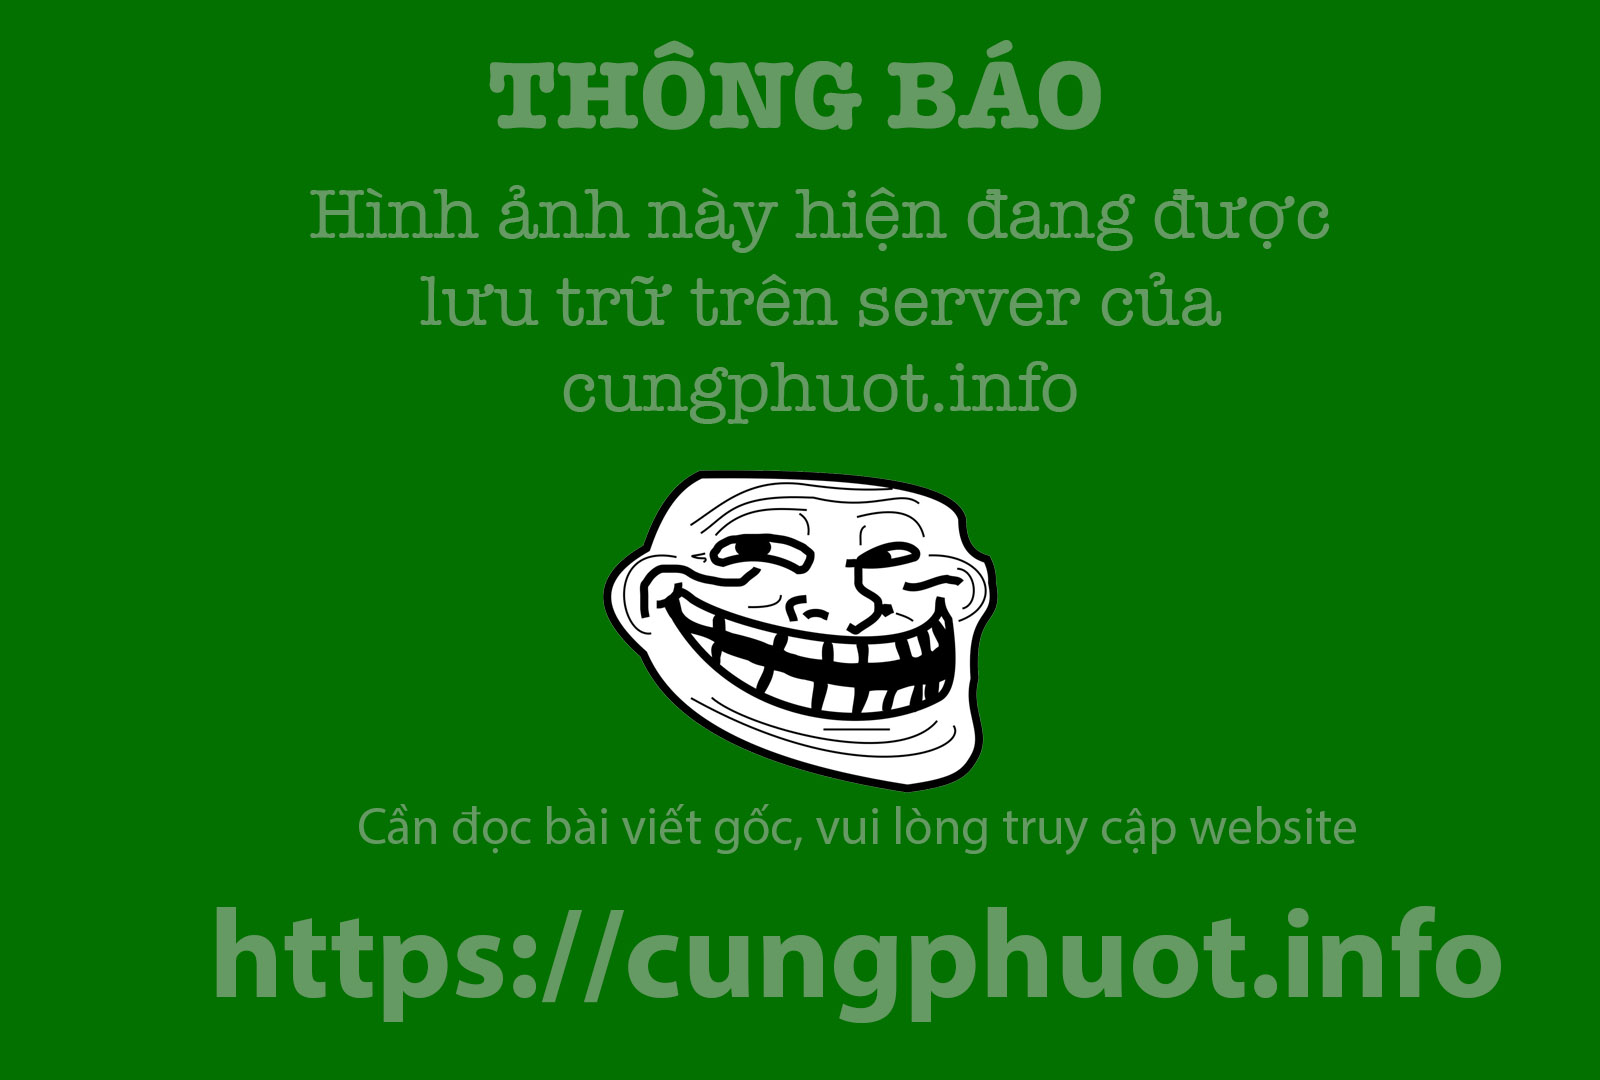 Co do Hue dep la trong suong mu hinh anh 3